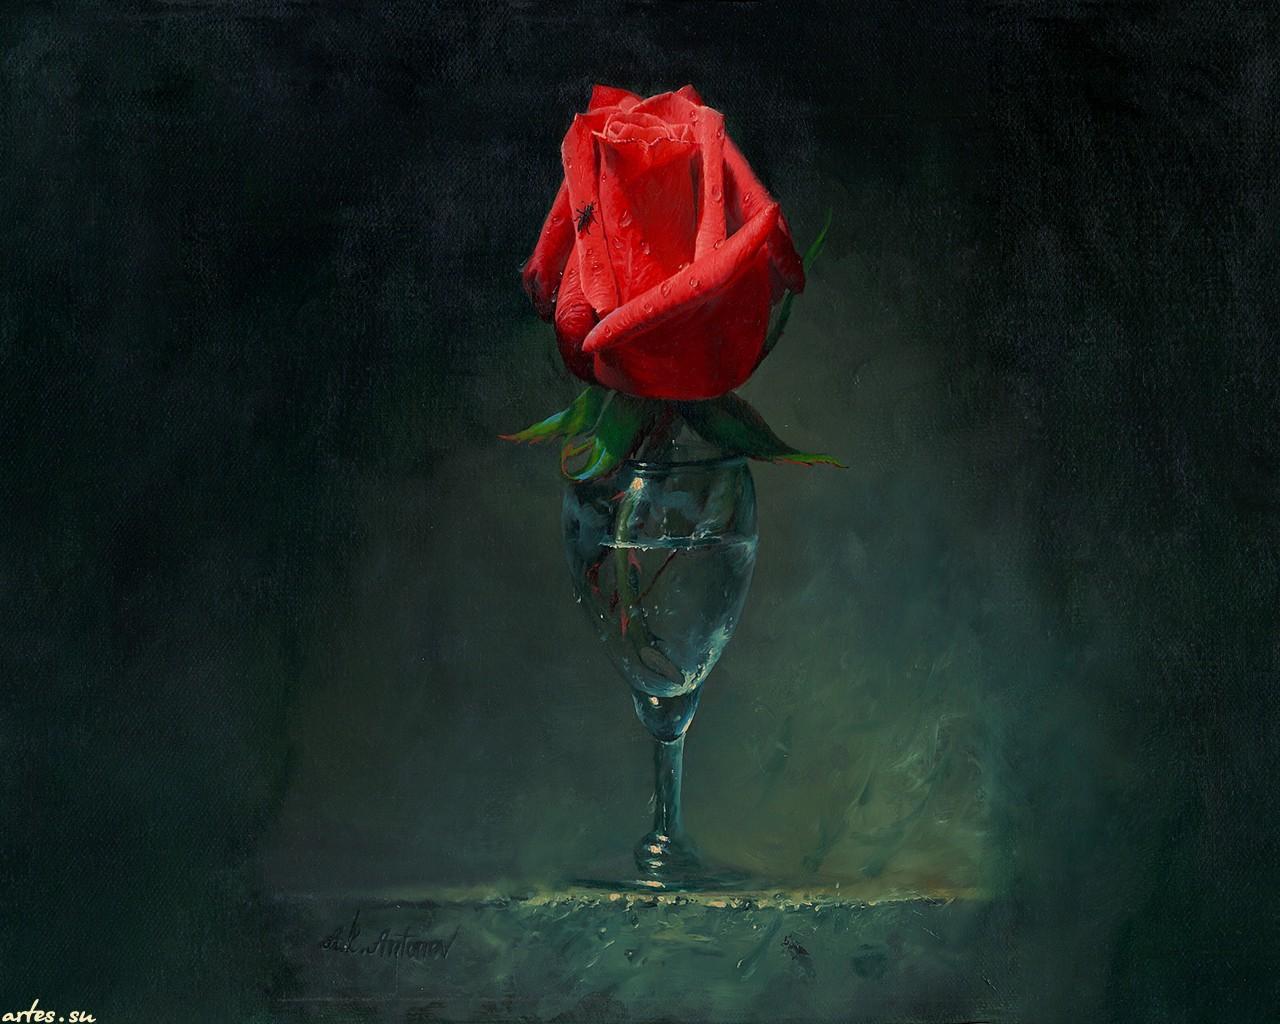 http://www.artes.su/wallpapers/01a67c6430cc7463932ebbe4480ba0a5/1724_4.jpg